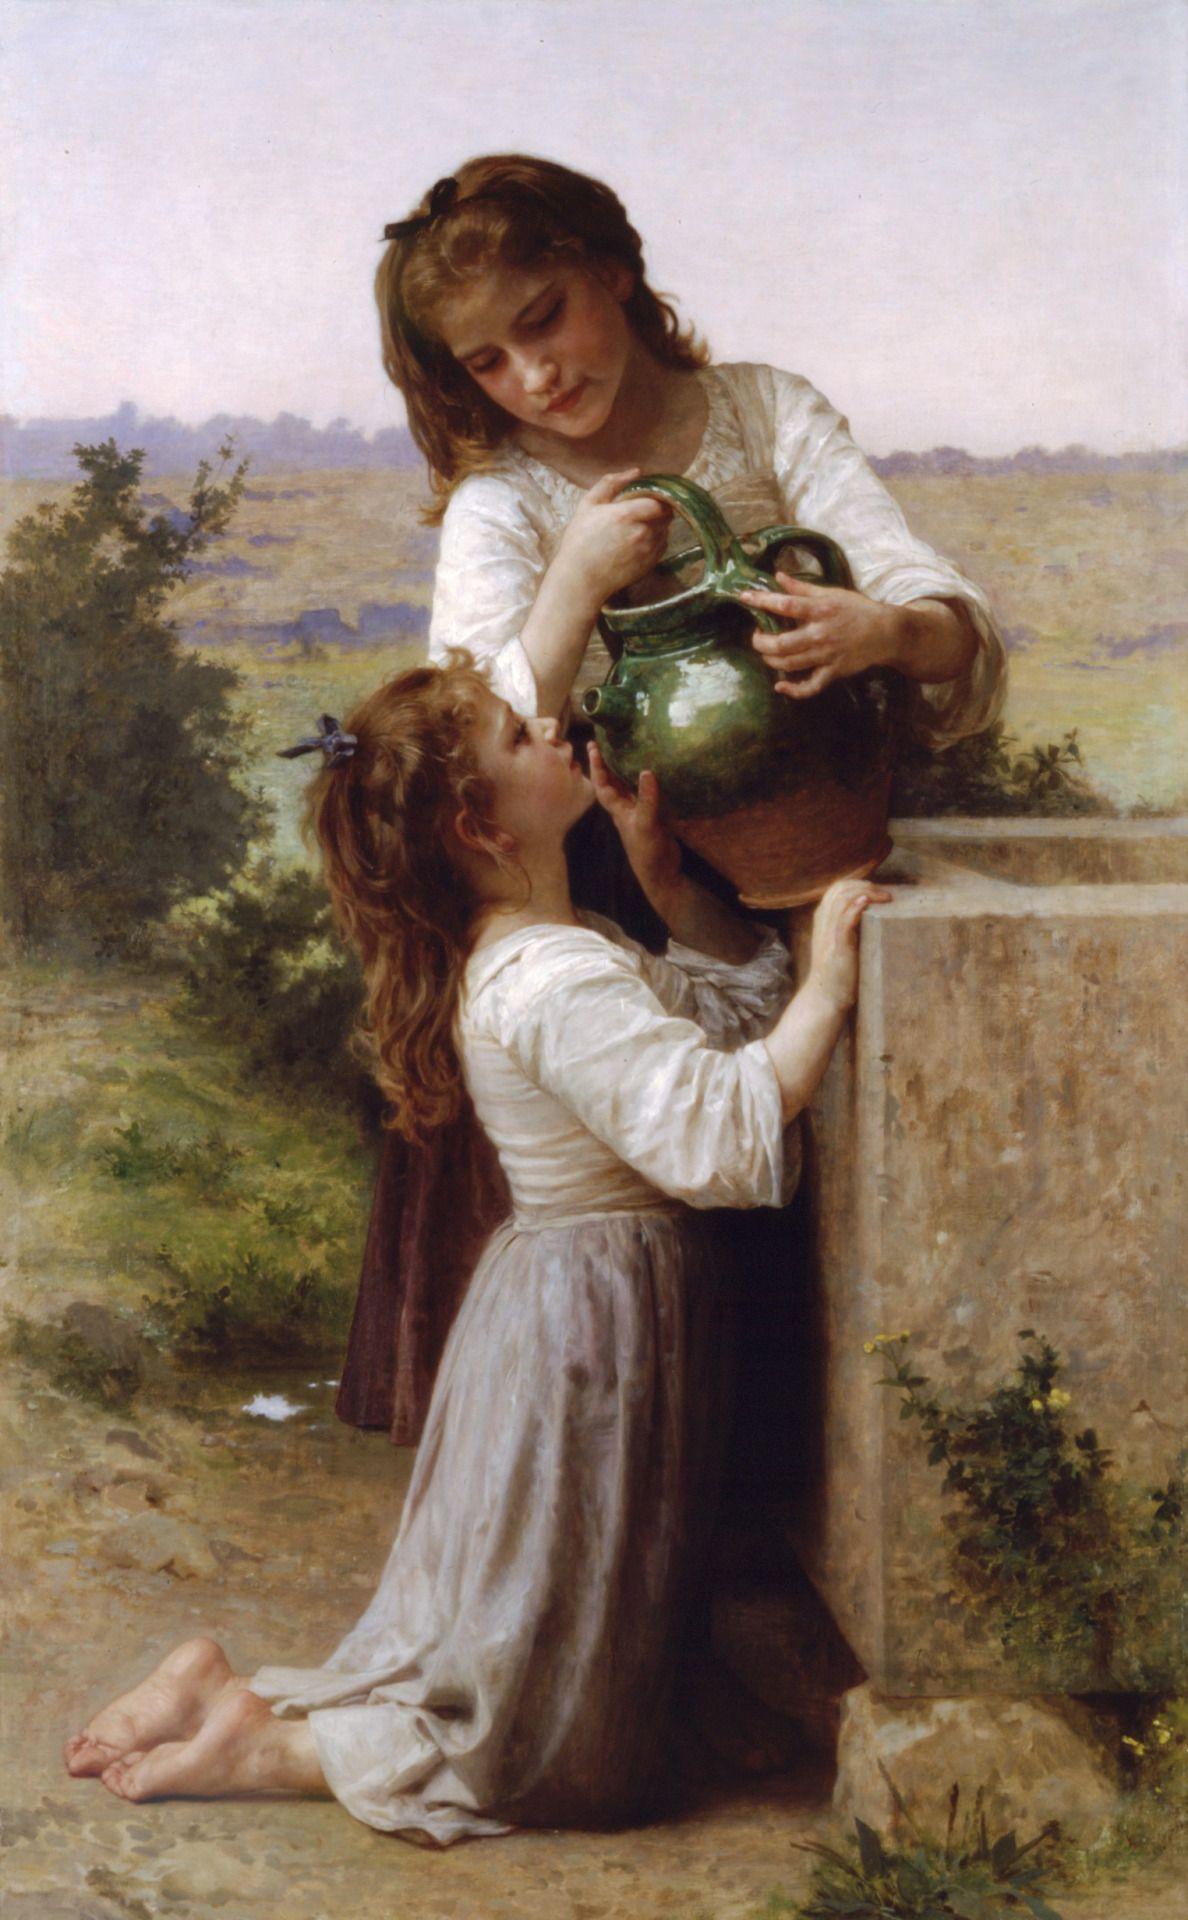 thepaintinghasalifeofitsown:  William-Adolphe Bouguereau: At the fountain